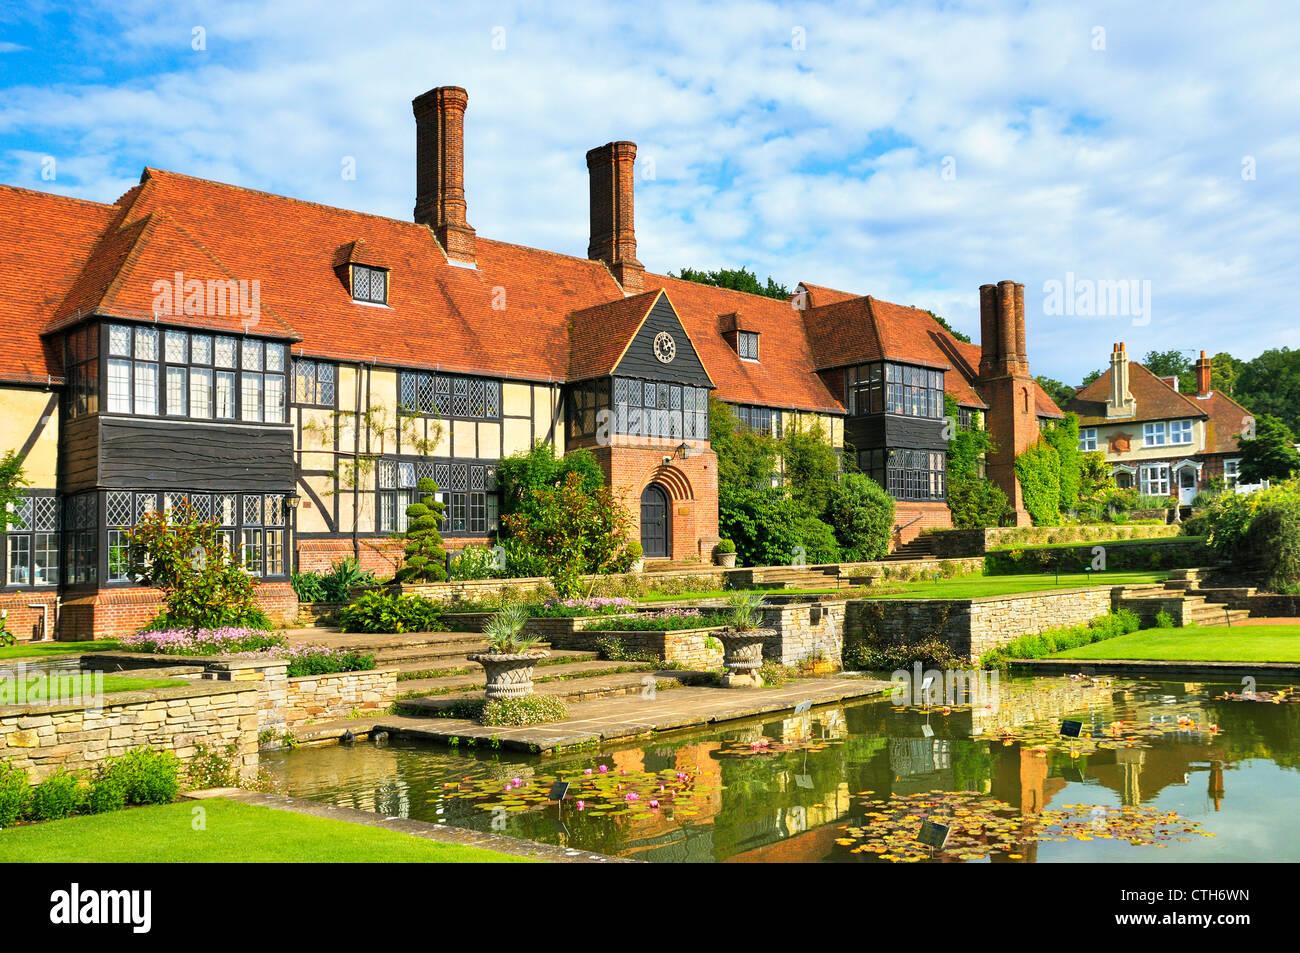 The Manor House, RHS Wisley, Woking, Surrey, UK - Stock Image